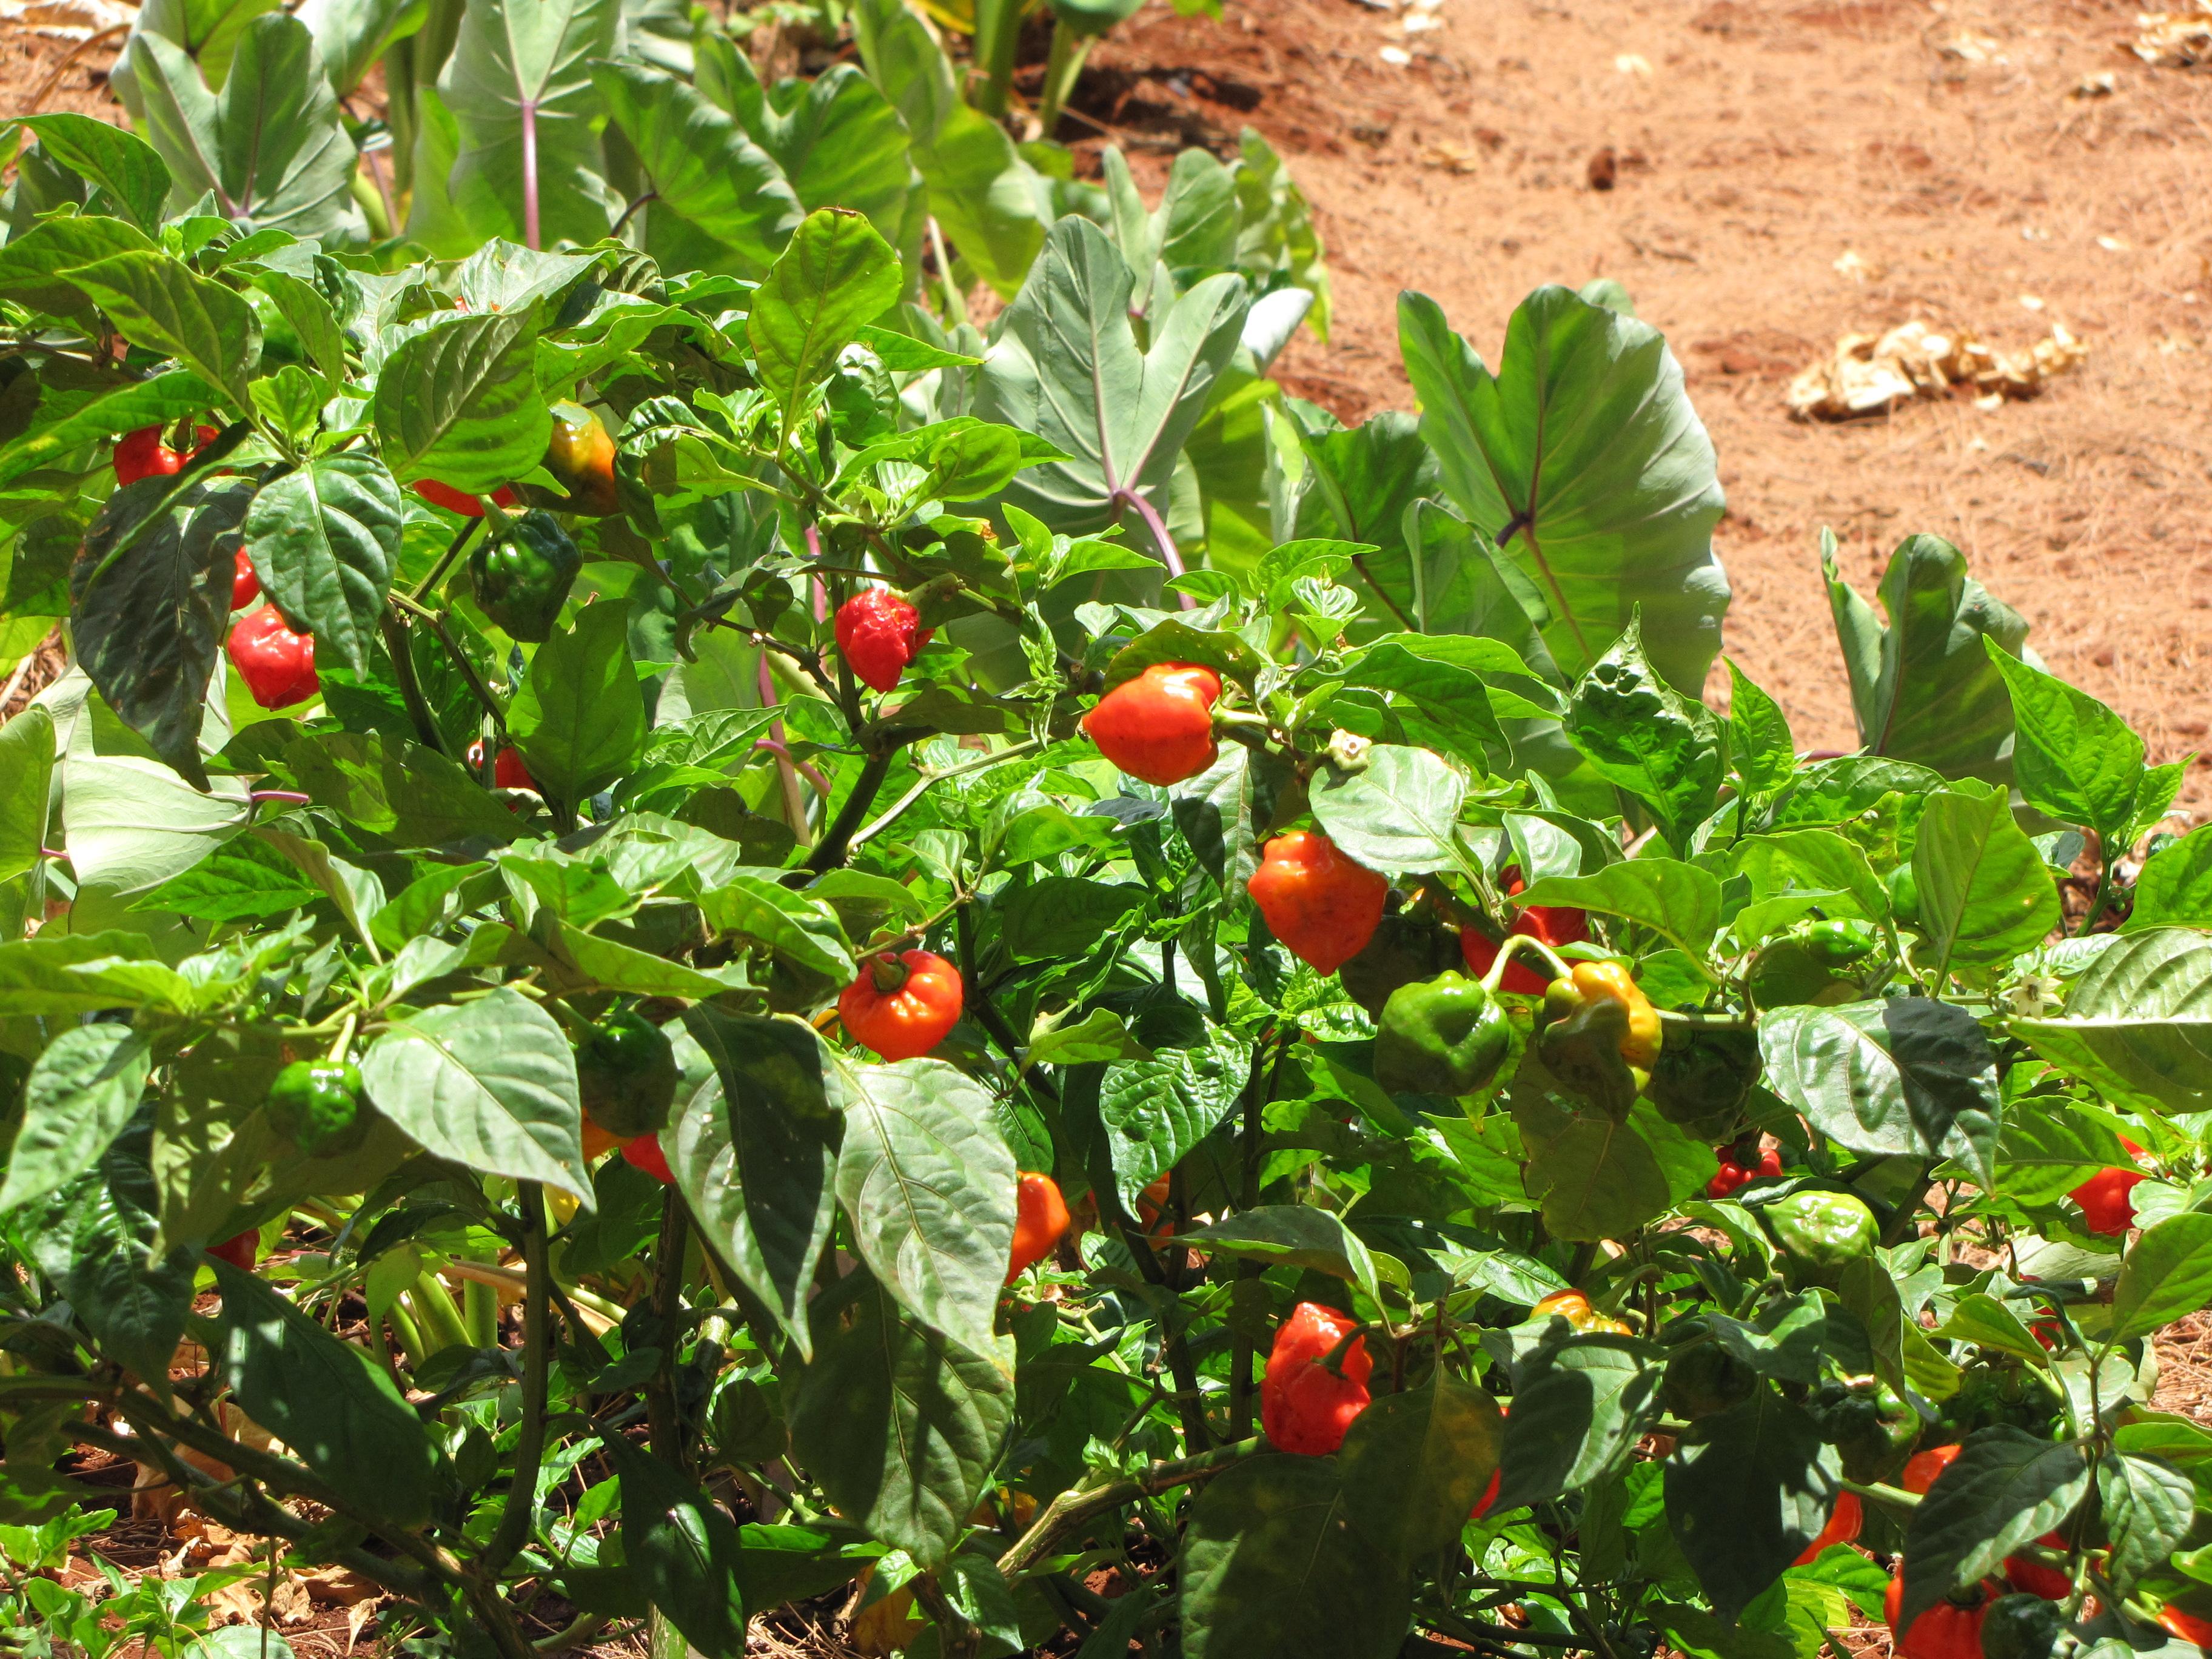 File:Starr-120702-7960-Capsicum annuum-habanero peppers fruiting habit-USDA  Plant Materials Center-Molokai (24818663919).jpg - Wikimedia Commons